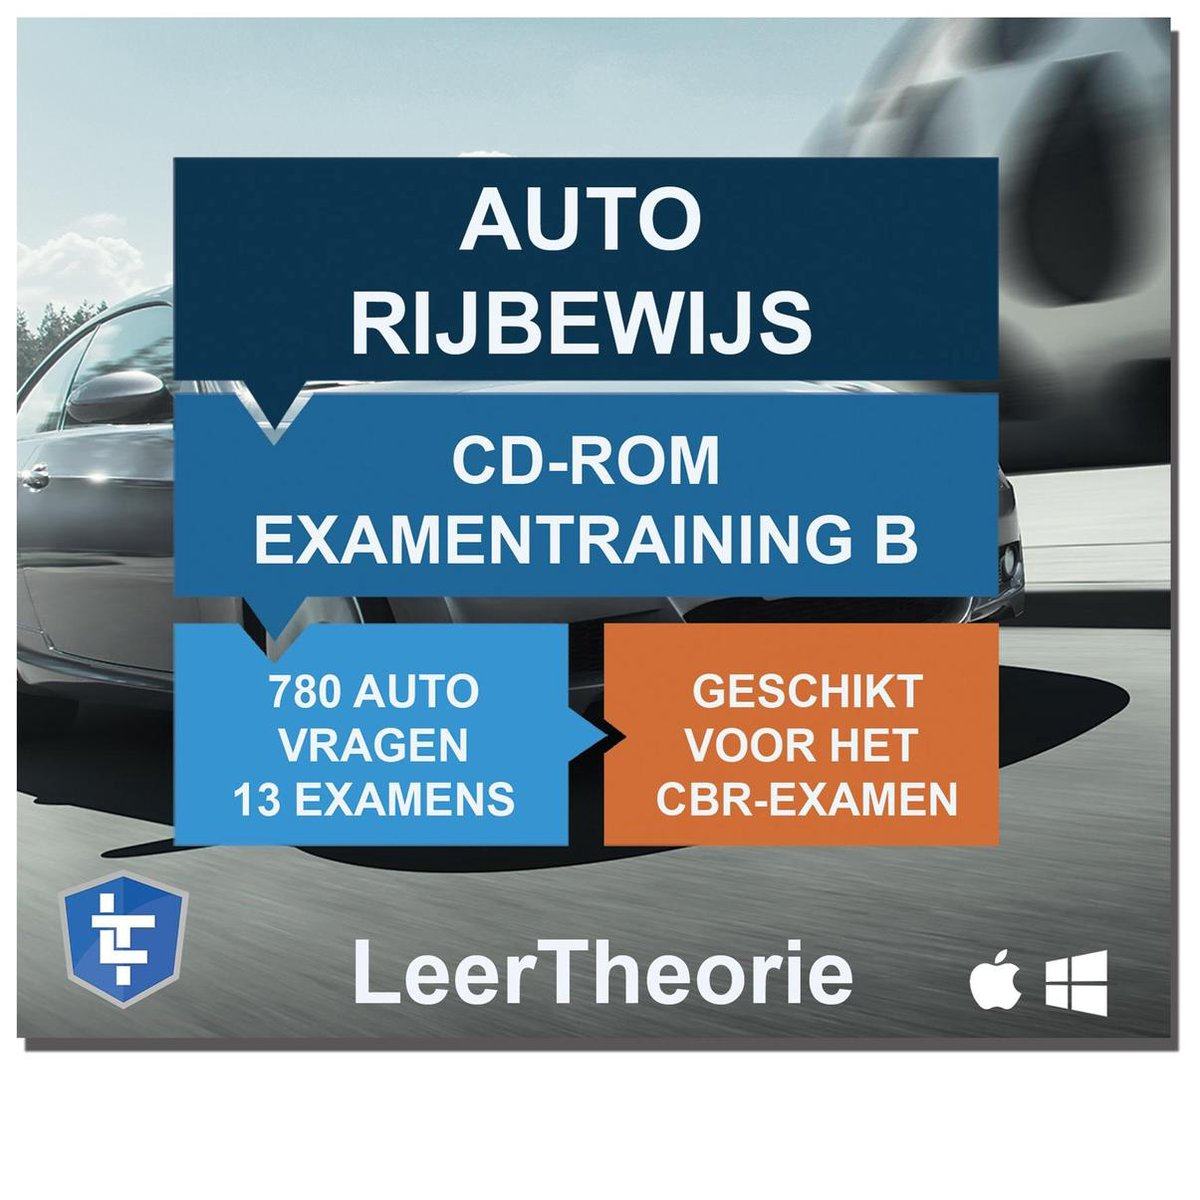 Auto Rijbewijs B - CD-ROM 2021 Auto Examentraining B - 845 oefenvragen - 13 Theorie Examens - Ontwor